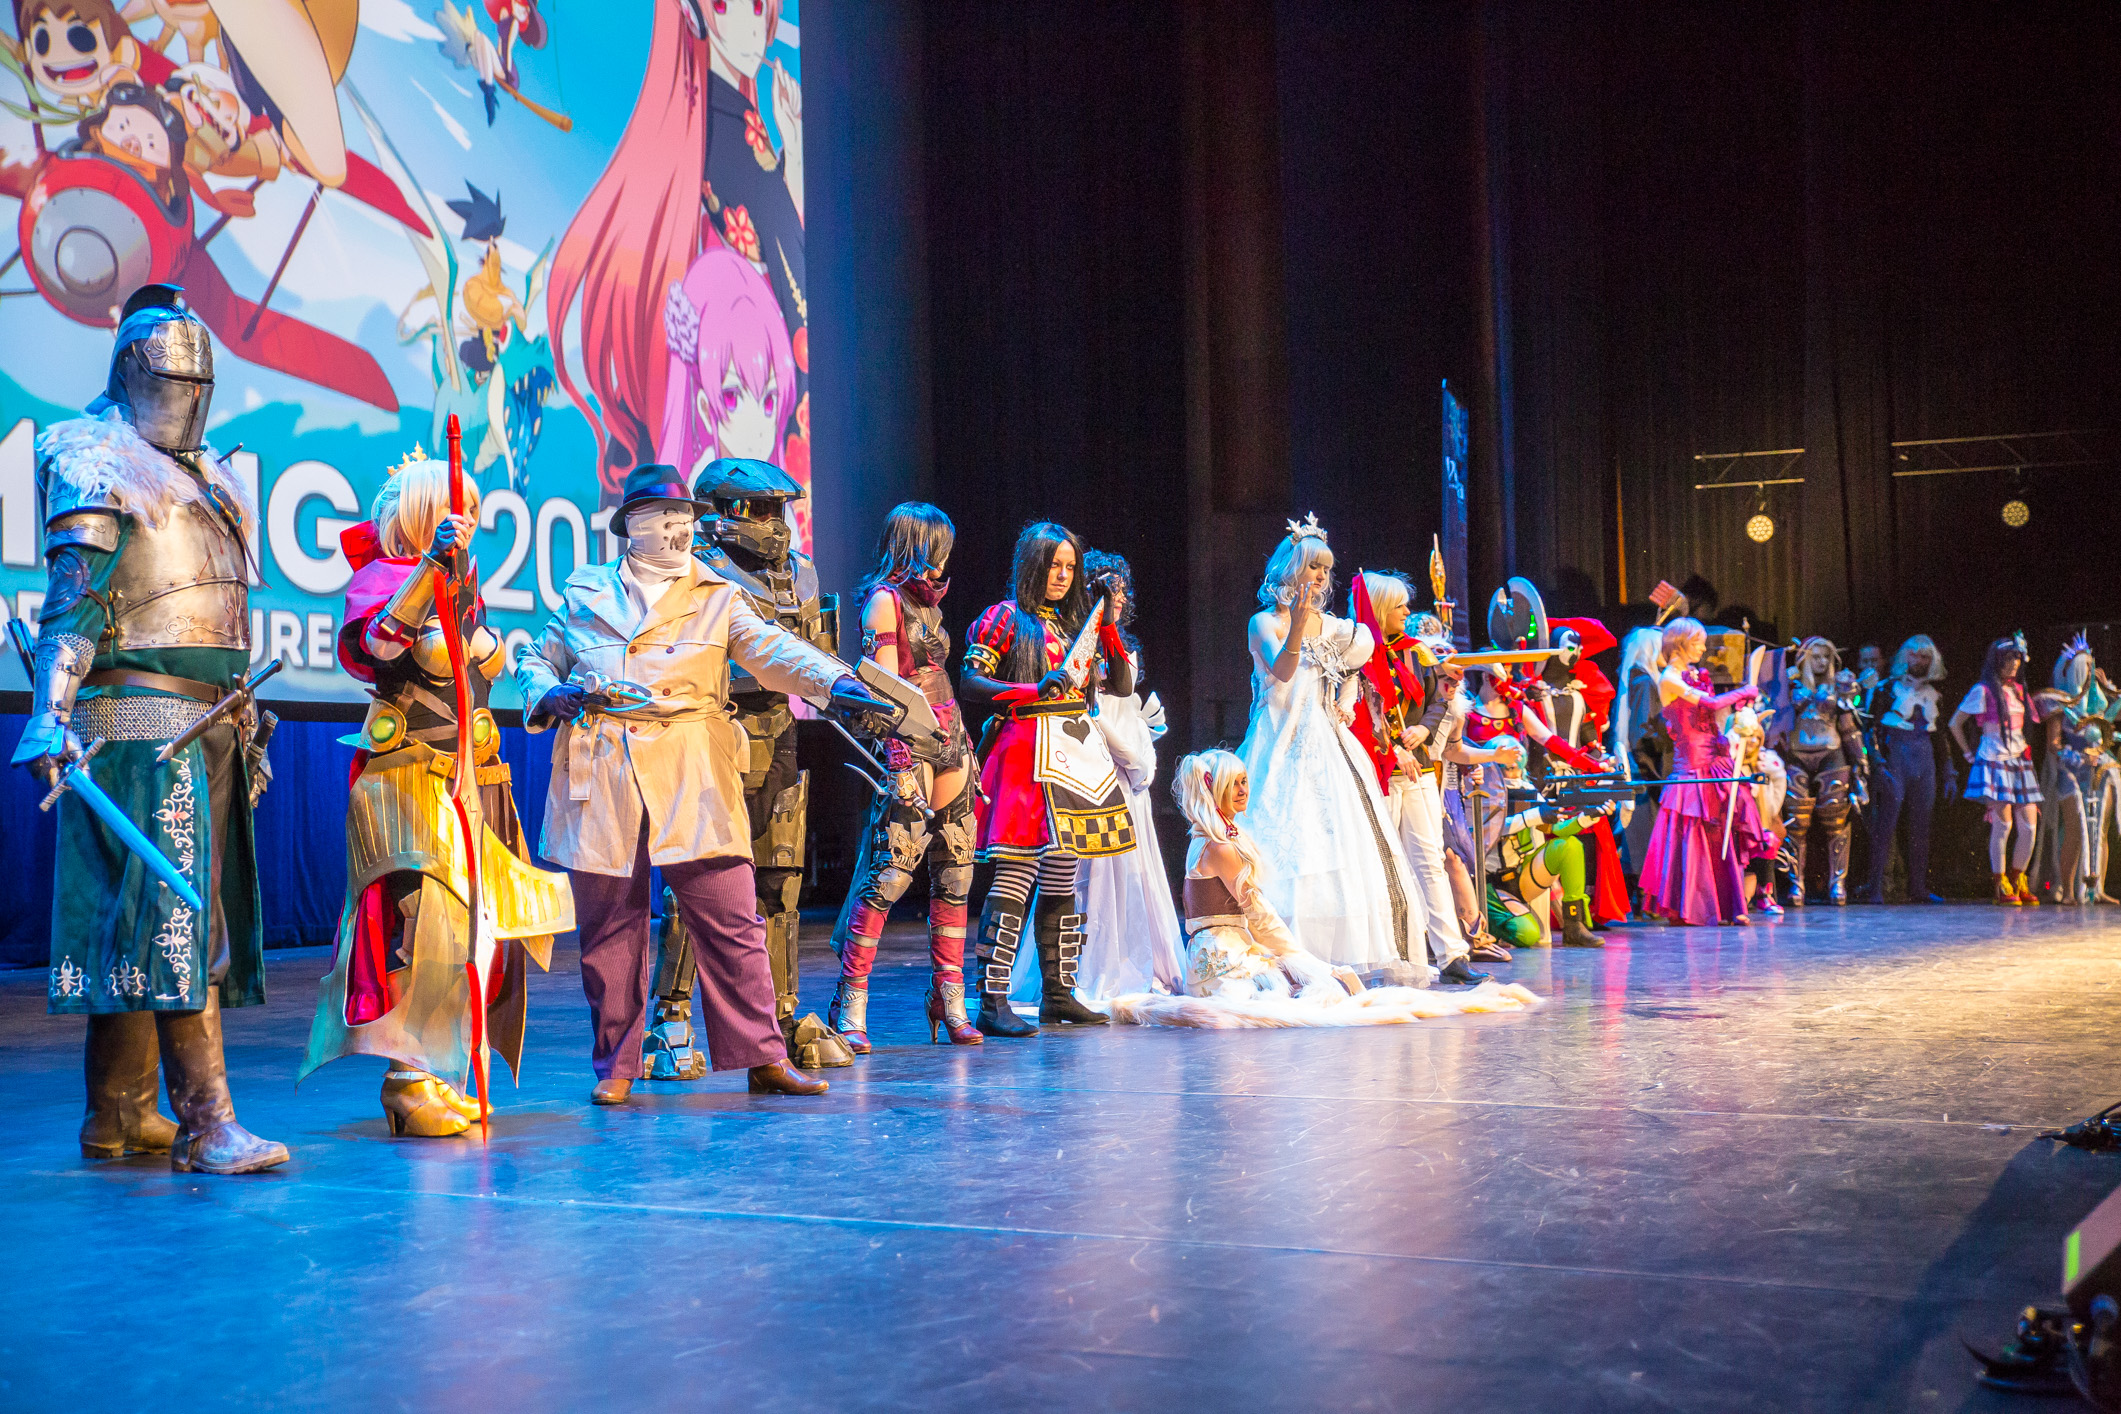 Polymanga 2016, 25-28 mars 2016, Montreux (Suisse). Concours cosplay individuel du samedi 26 mars.